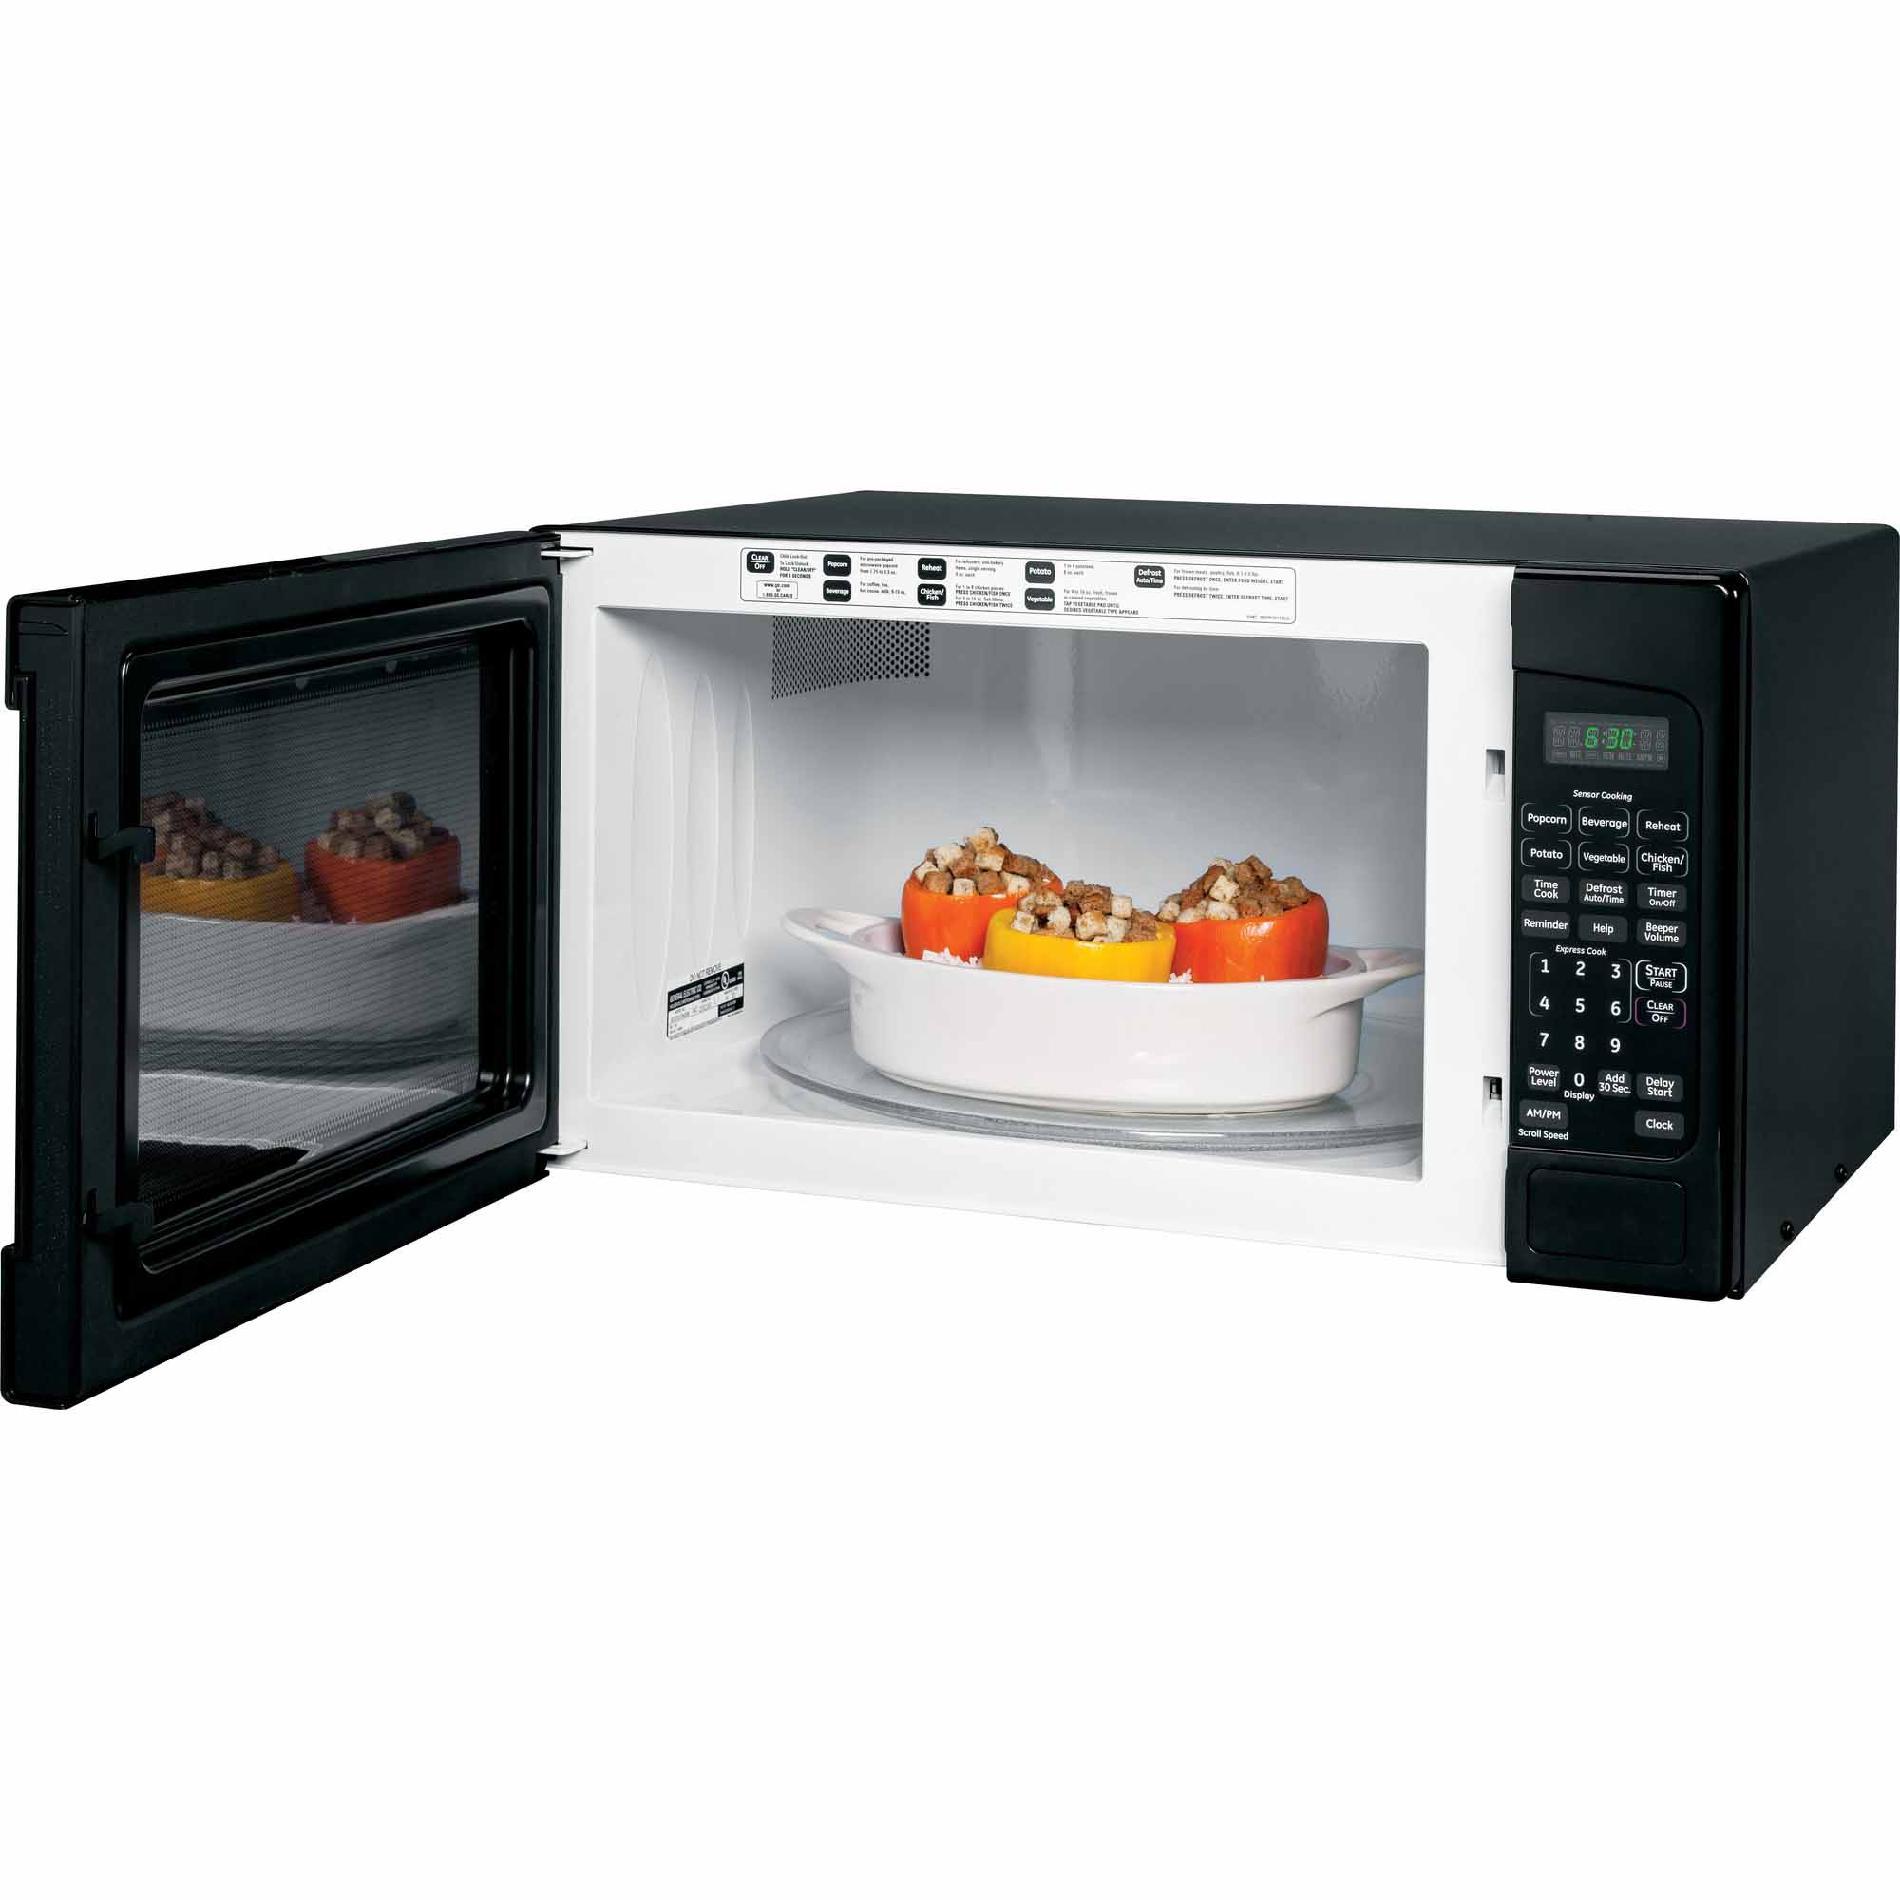 GE 2.0 cu. ft. Countertop Microwave Oven - Black